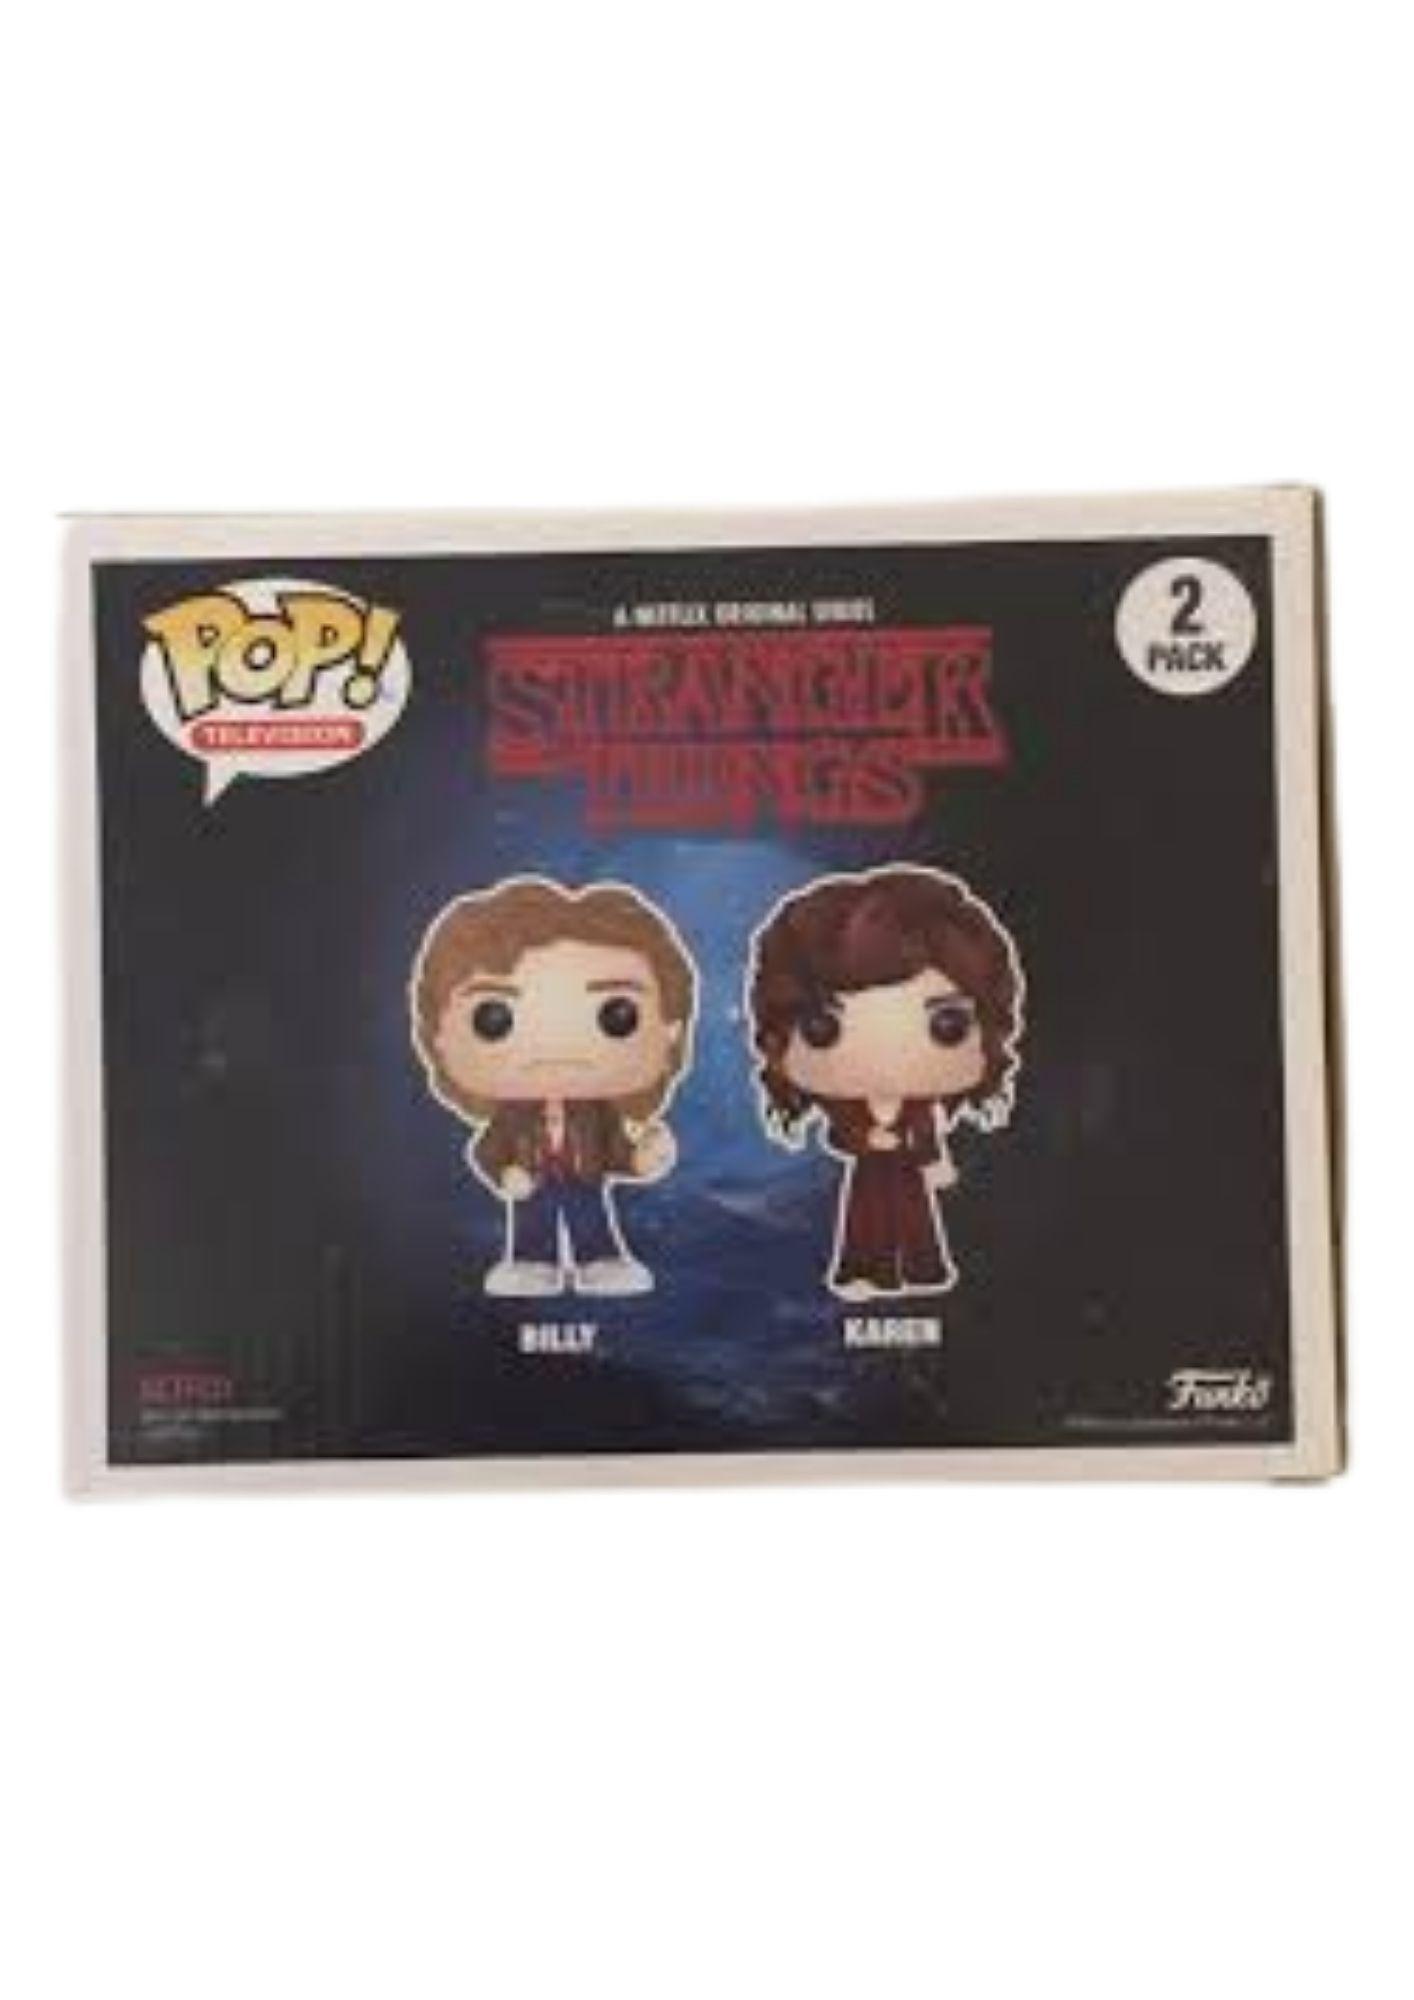 Funko Pop Stranger Things Billy e Karen Sdcc   - Game Land Brinquedos